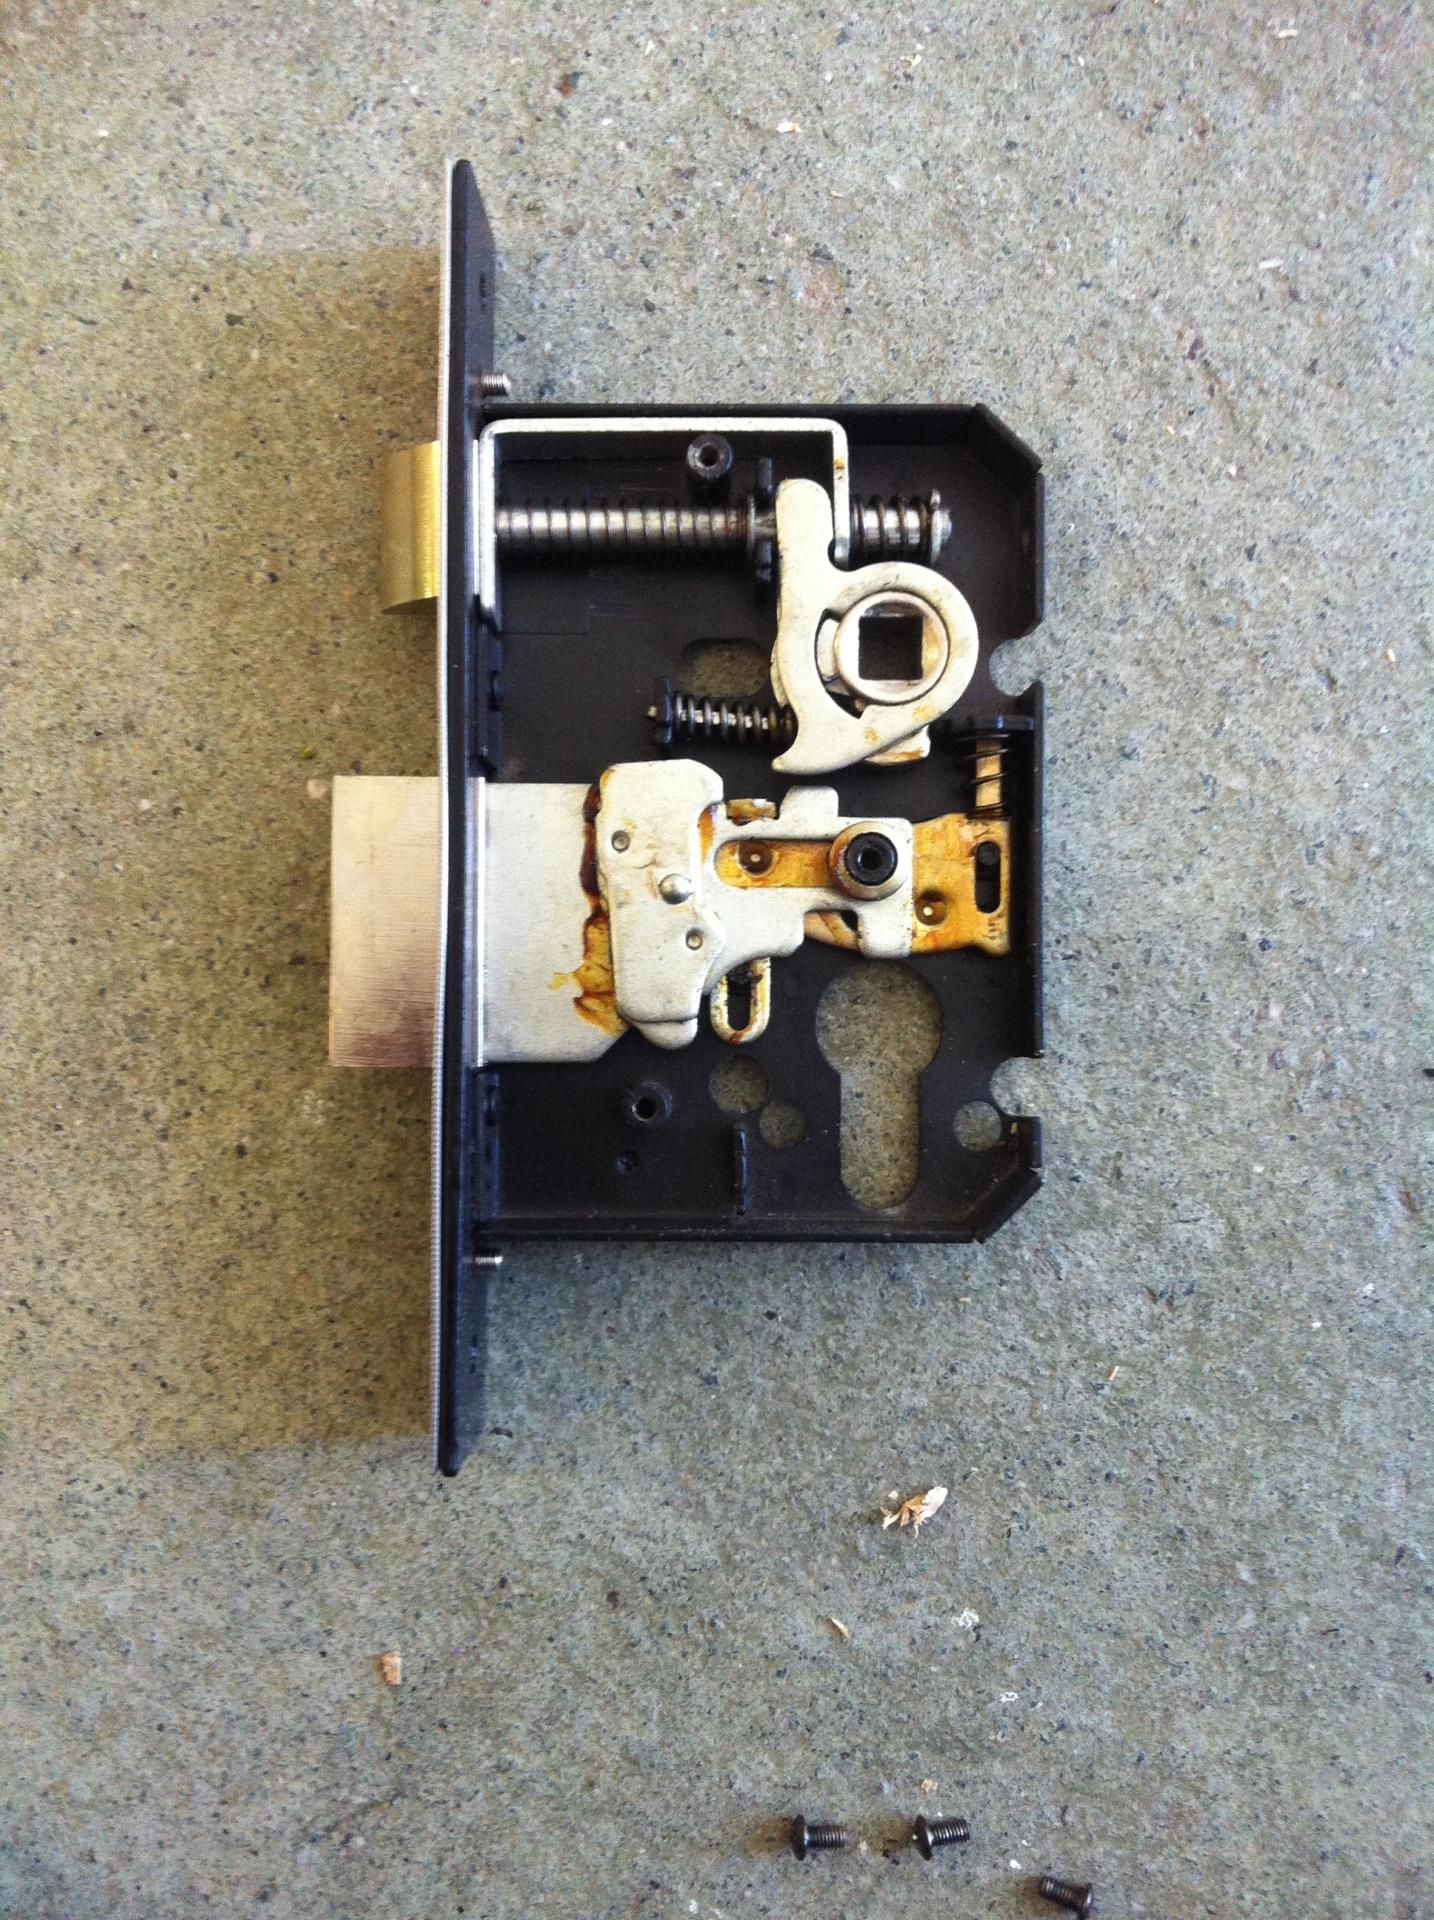 Inside a mortice lock